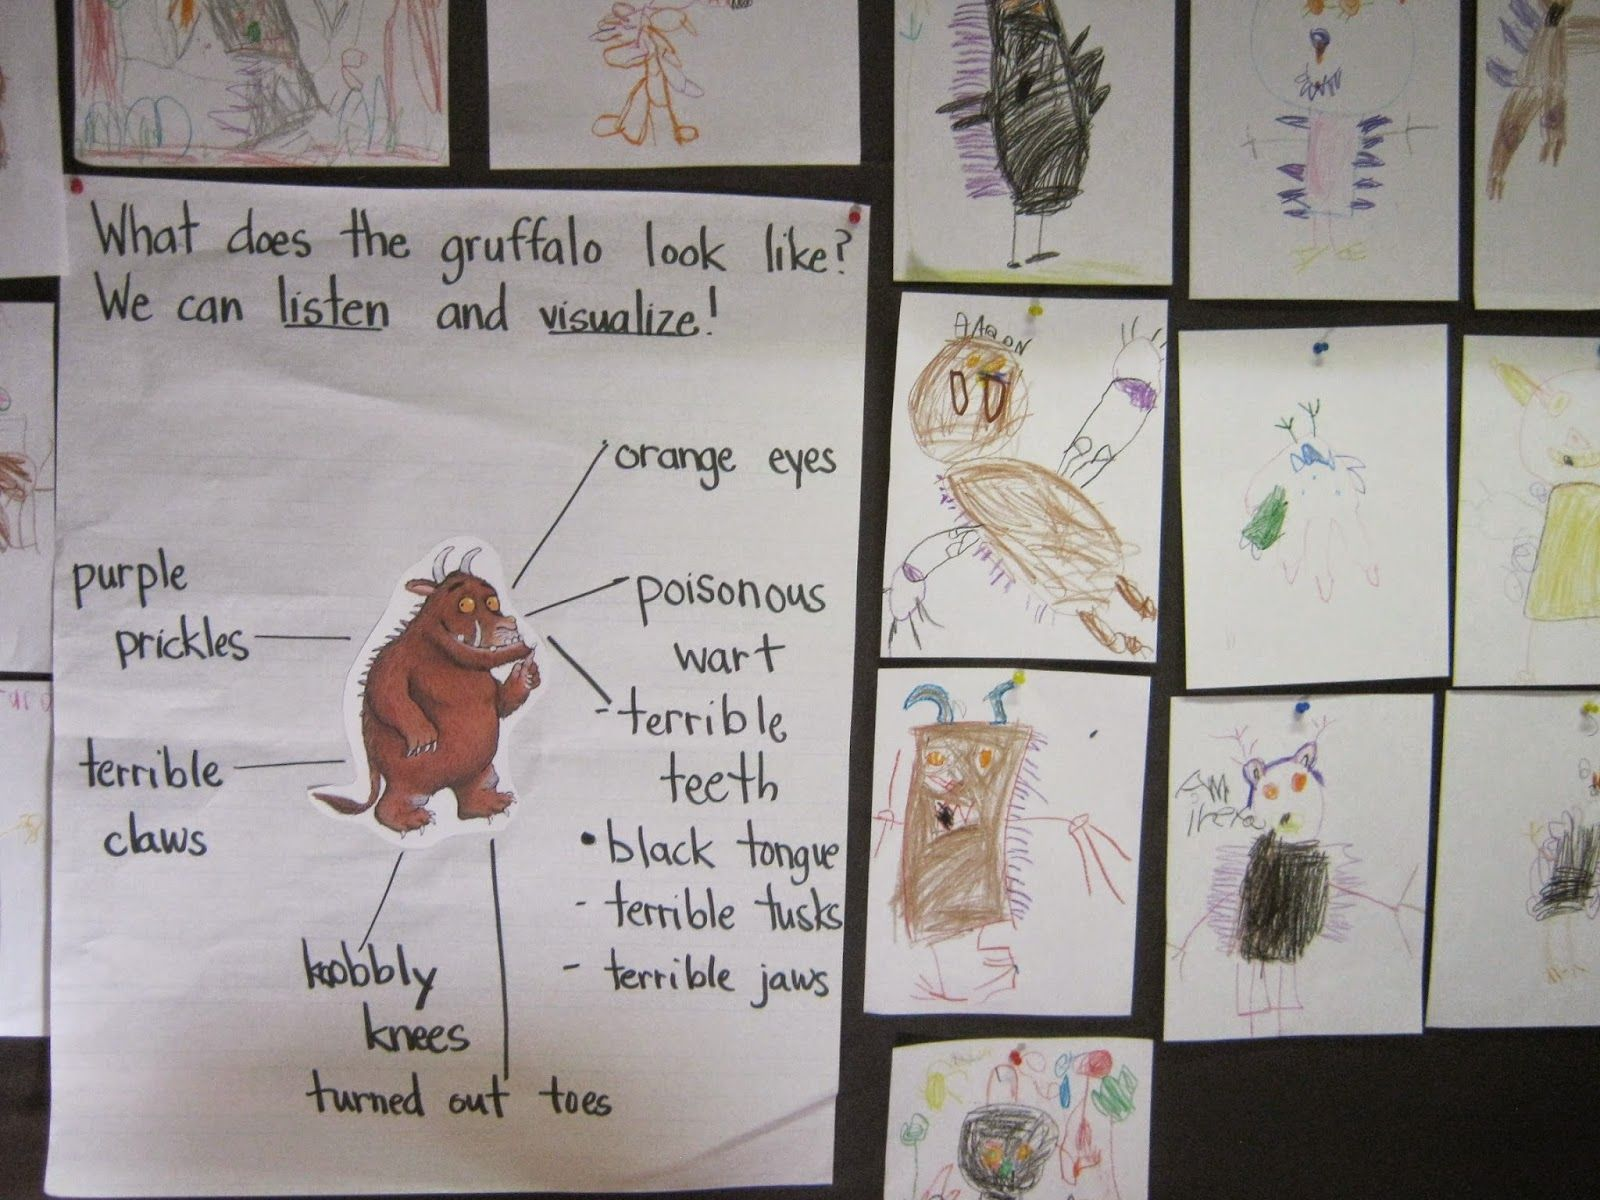 Abcs Of Reading Visualizing Inferring Visual Art Drama Teaching